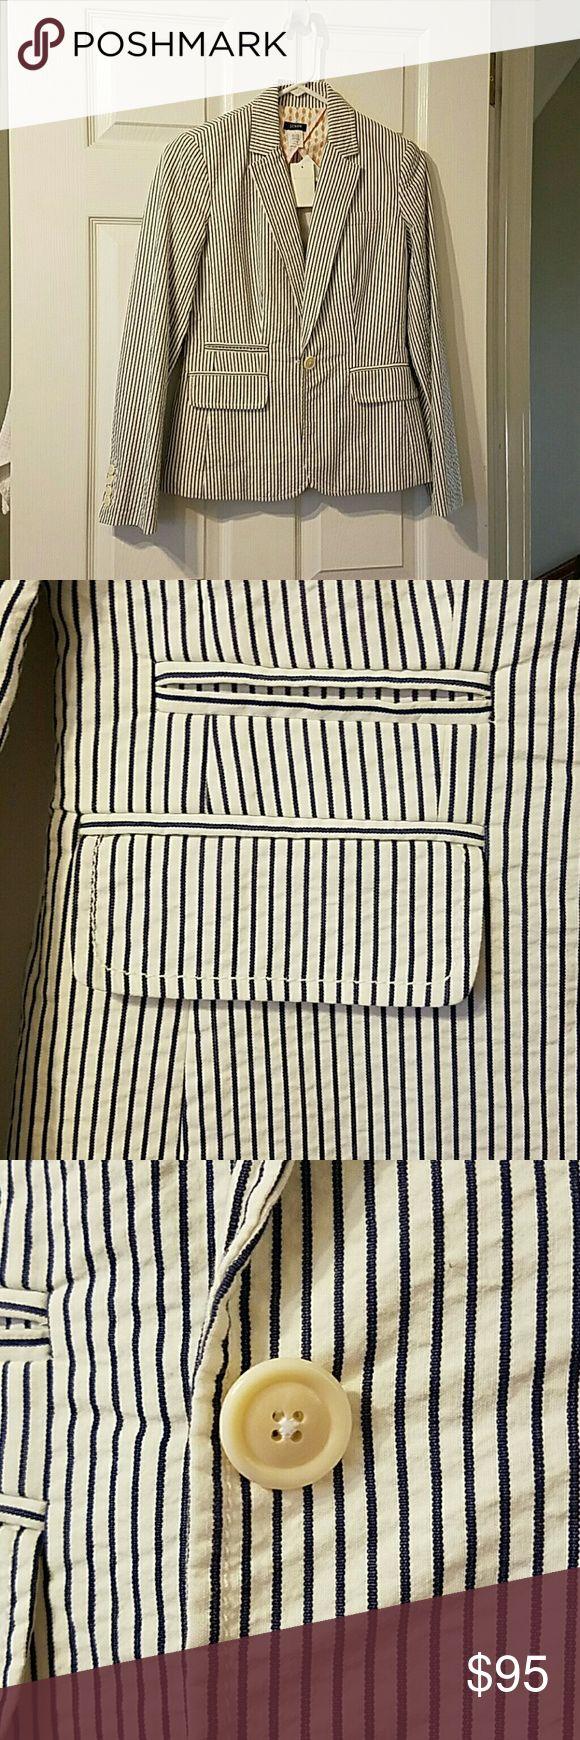 JCrew seersucker blazer Brand new, never worn seersucker blazer from JCrew. J. Crew Jackets & Coats Blazers